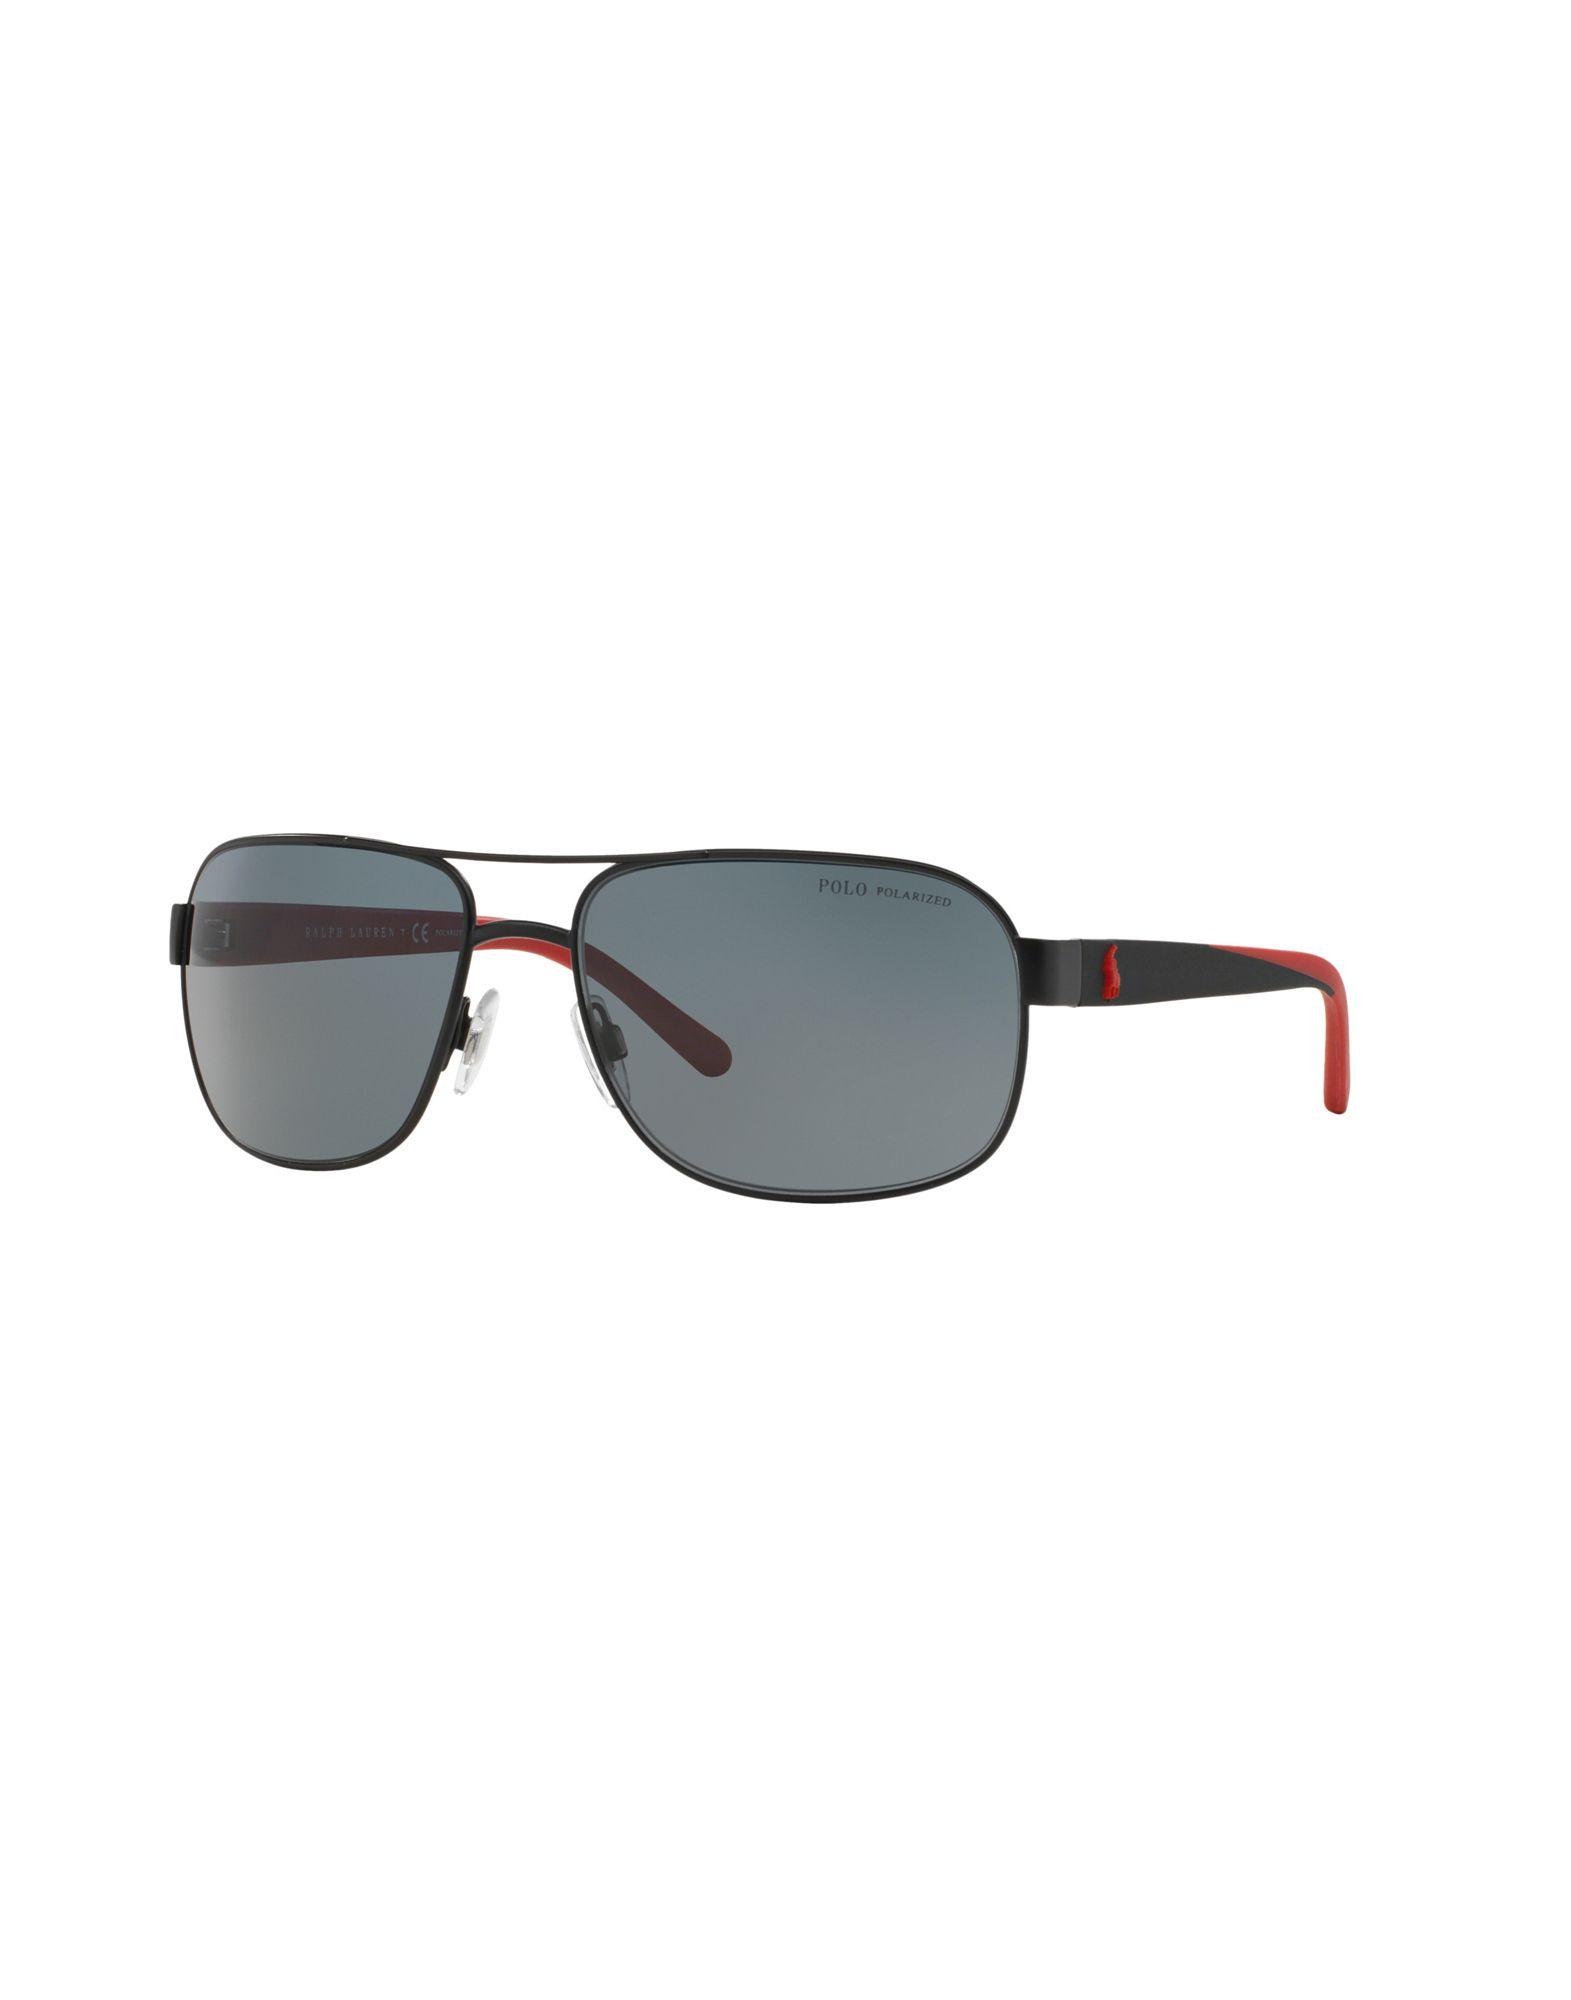 Polo Ralph Lauren Sunglasses In Black